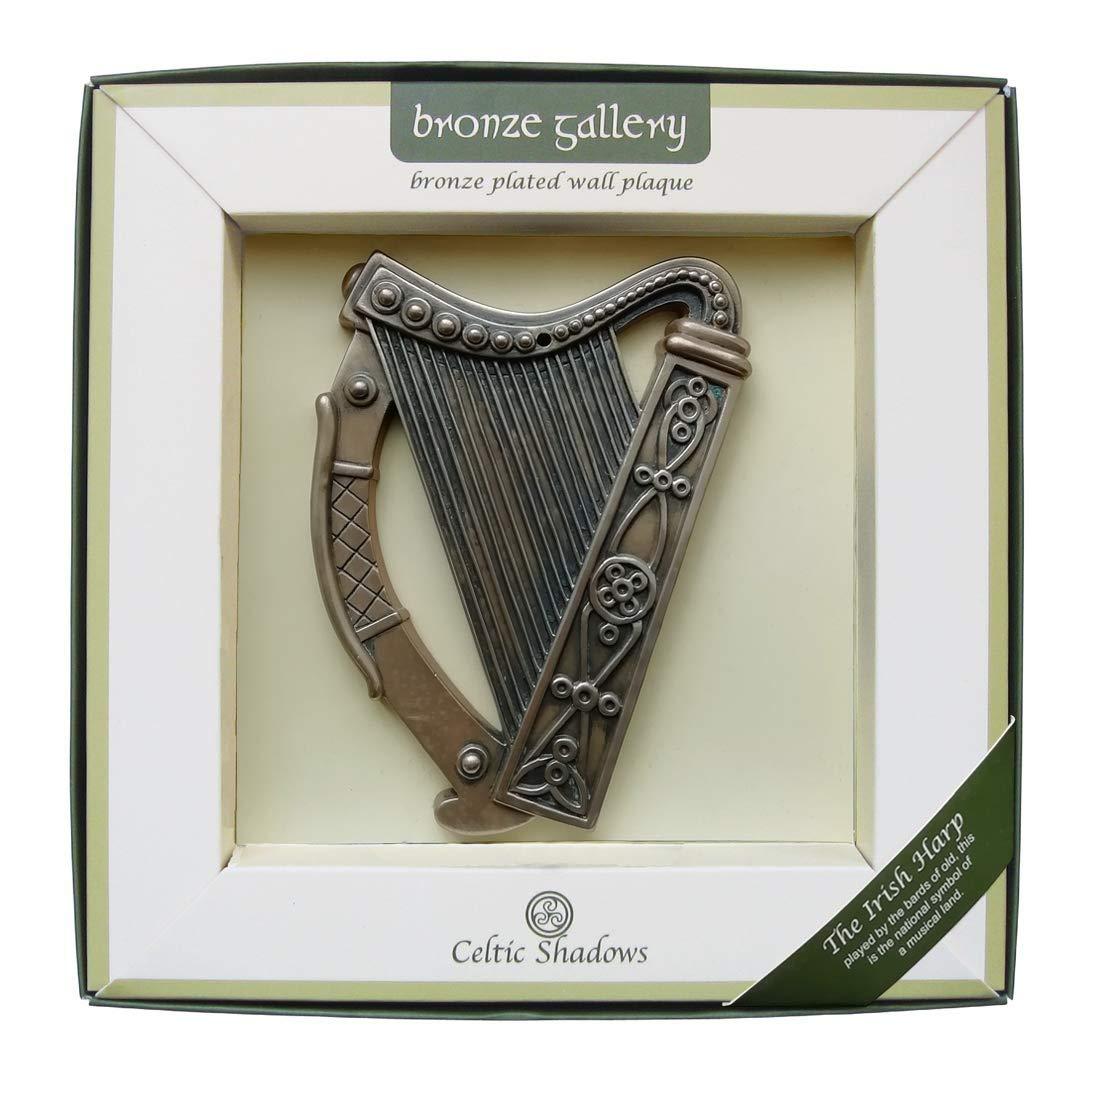 Royal Tara Bronze Plated Wall Plaque With Irish Harp Design 16cm X 13cm